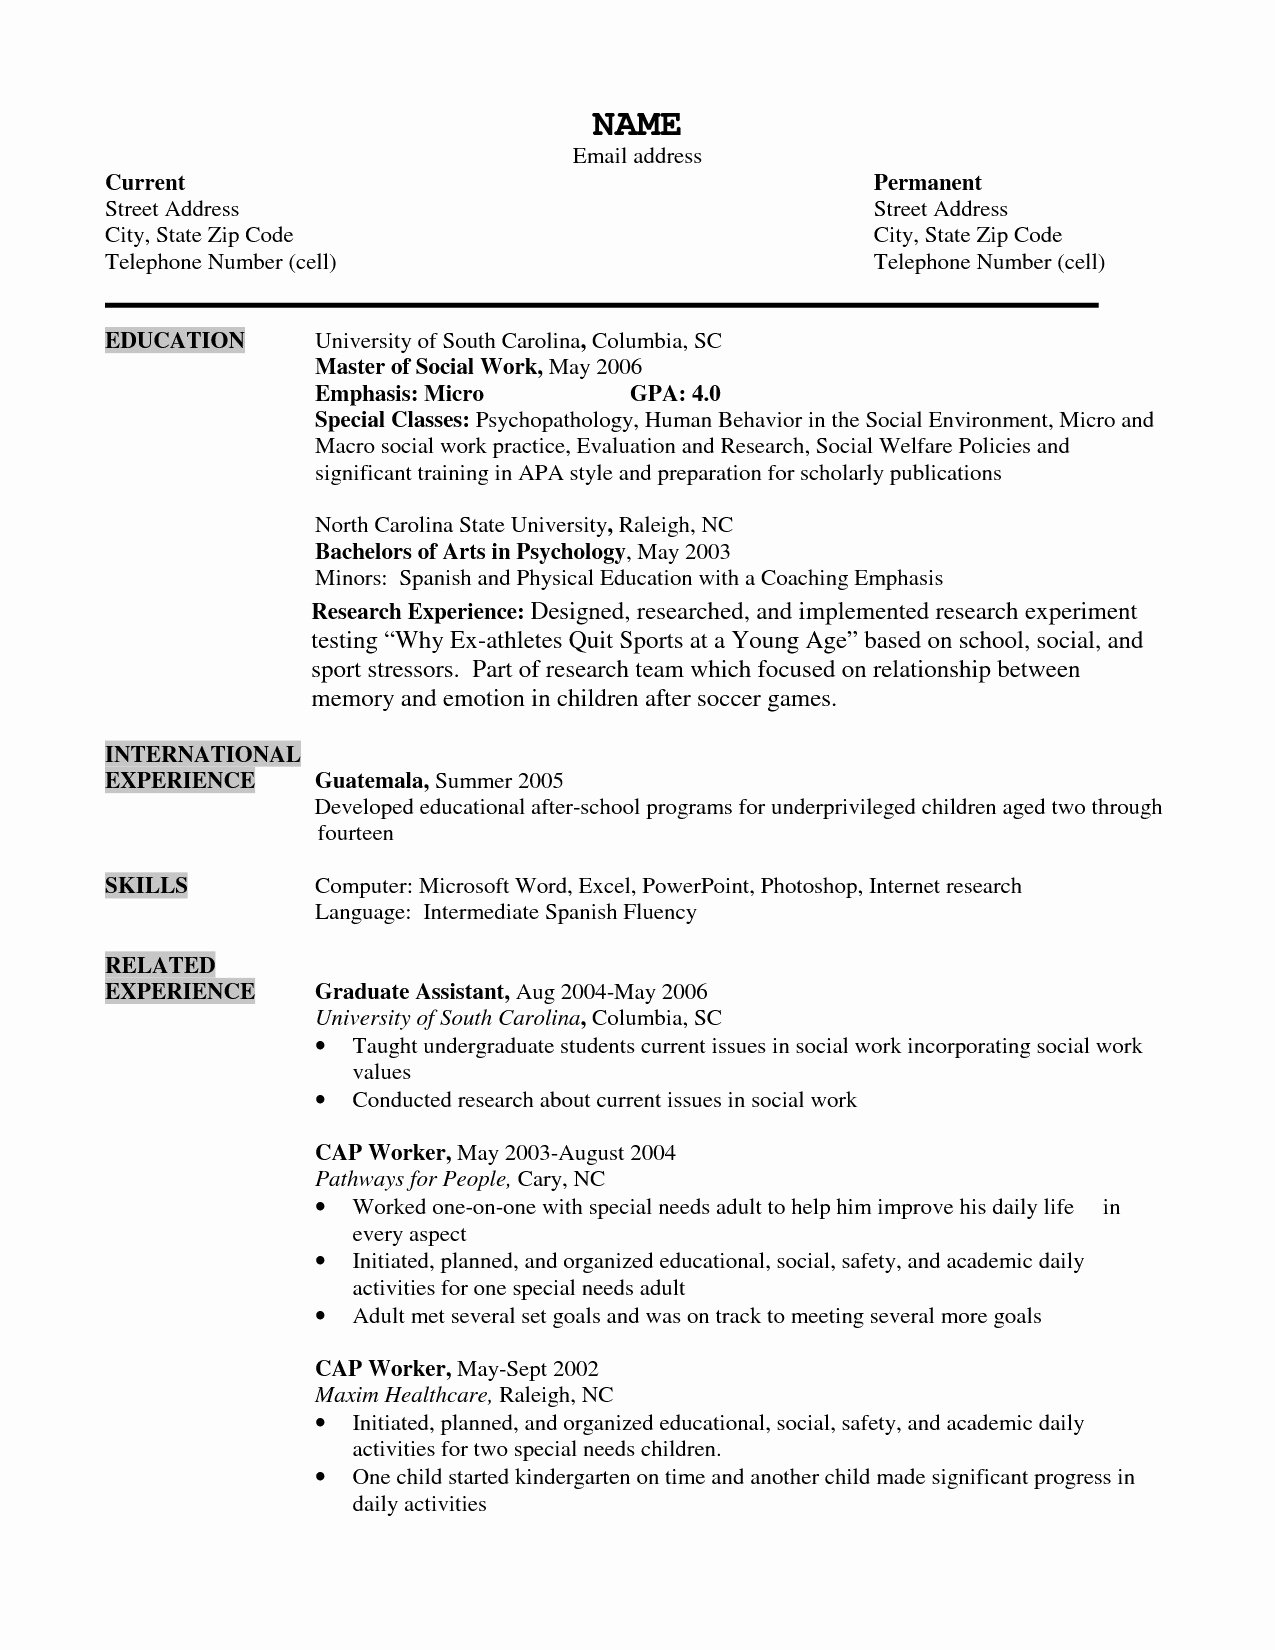 Social Worker Resume Templates Job Resume Sample social